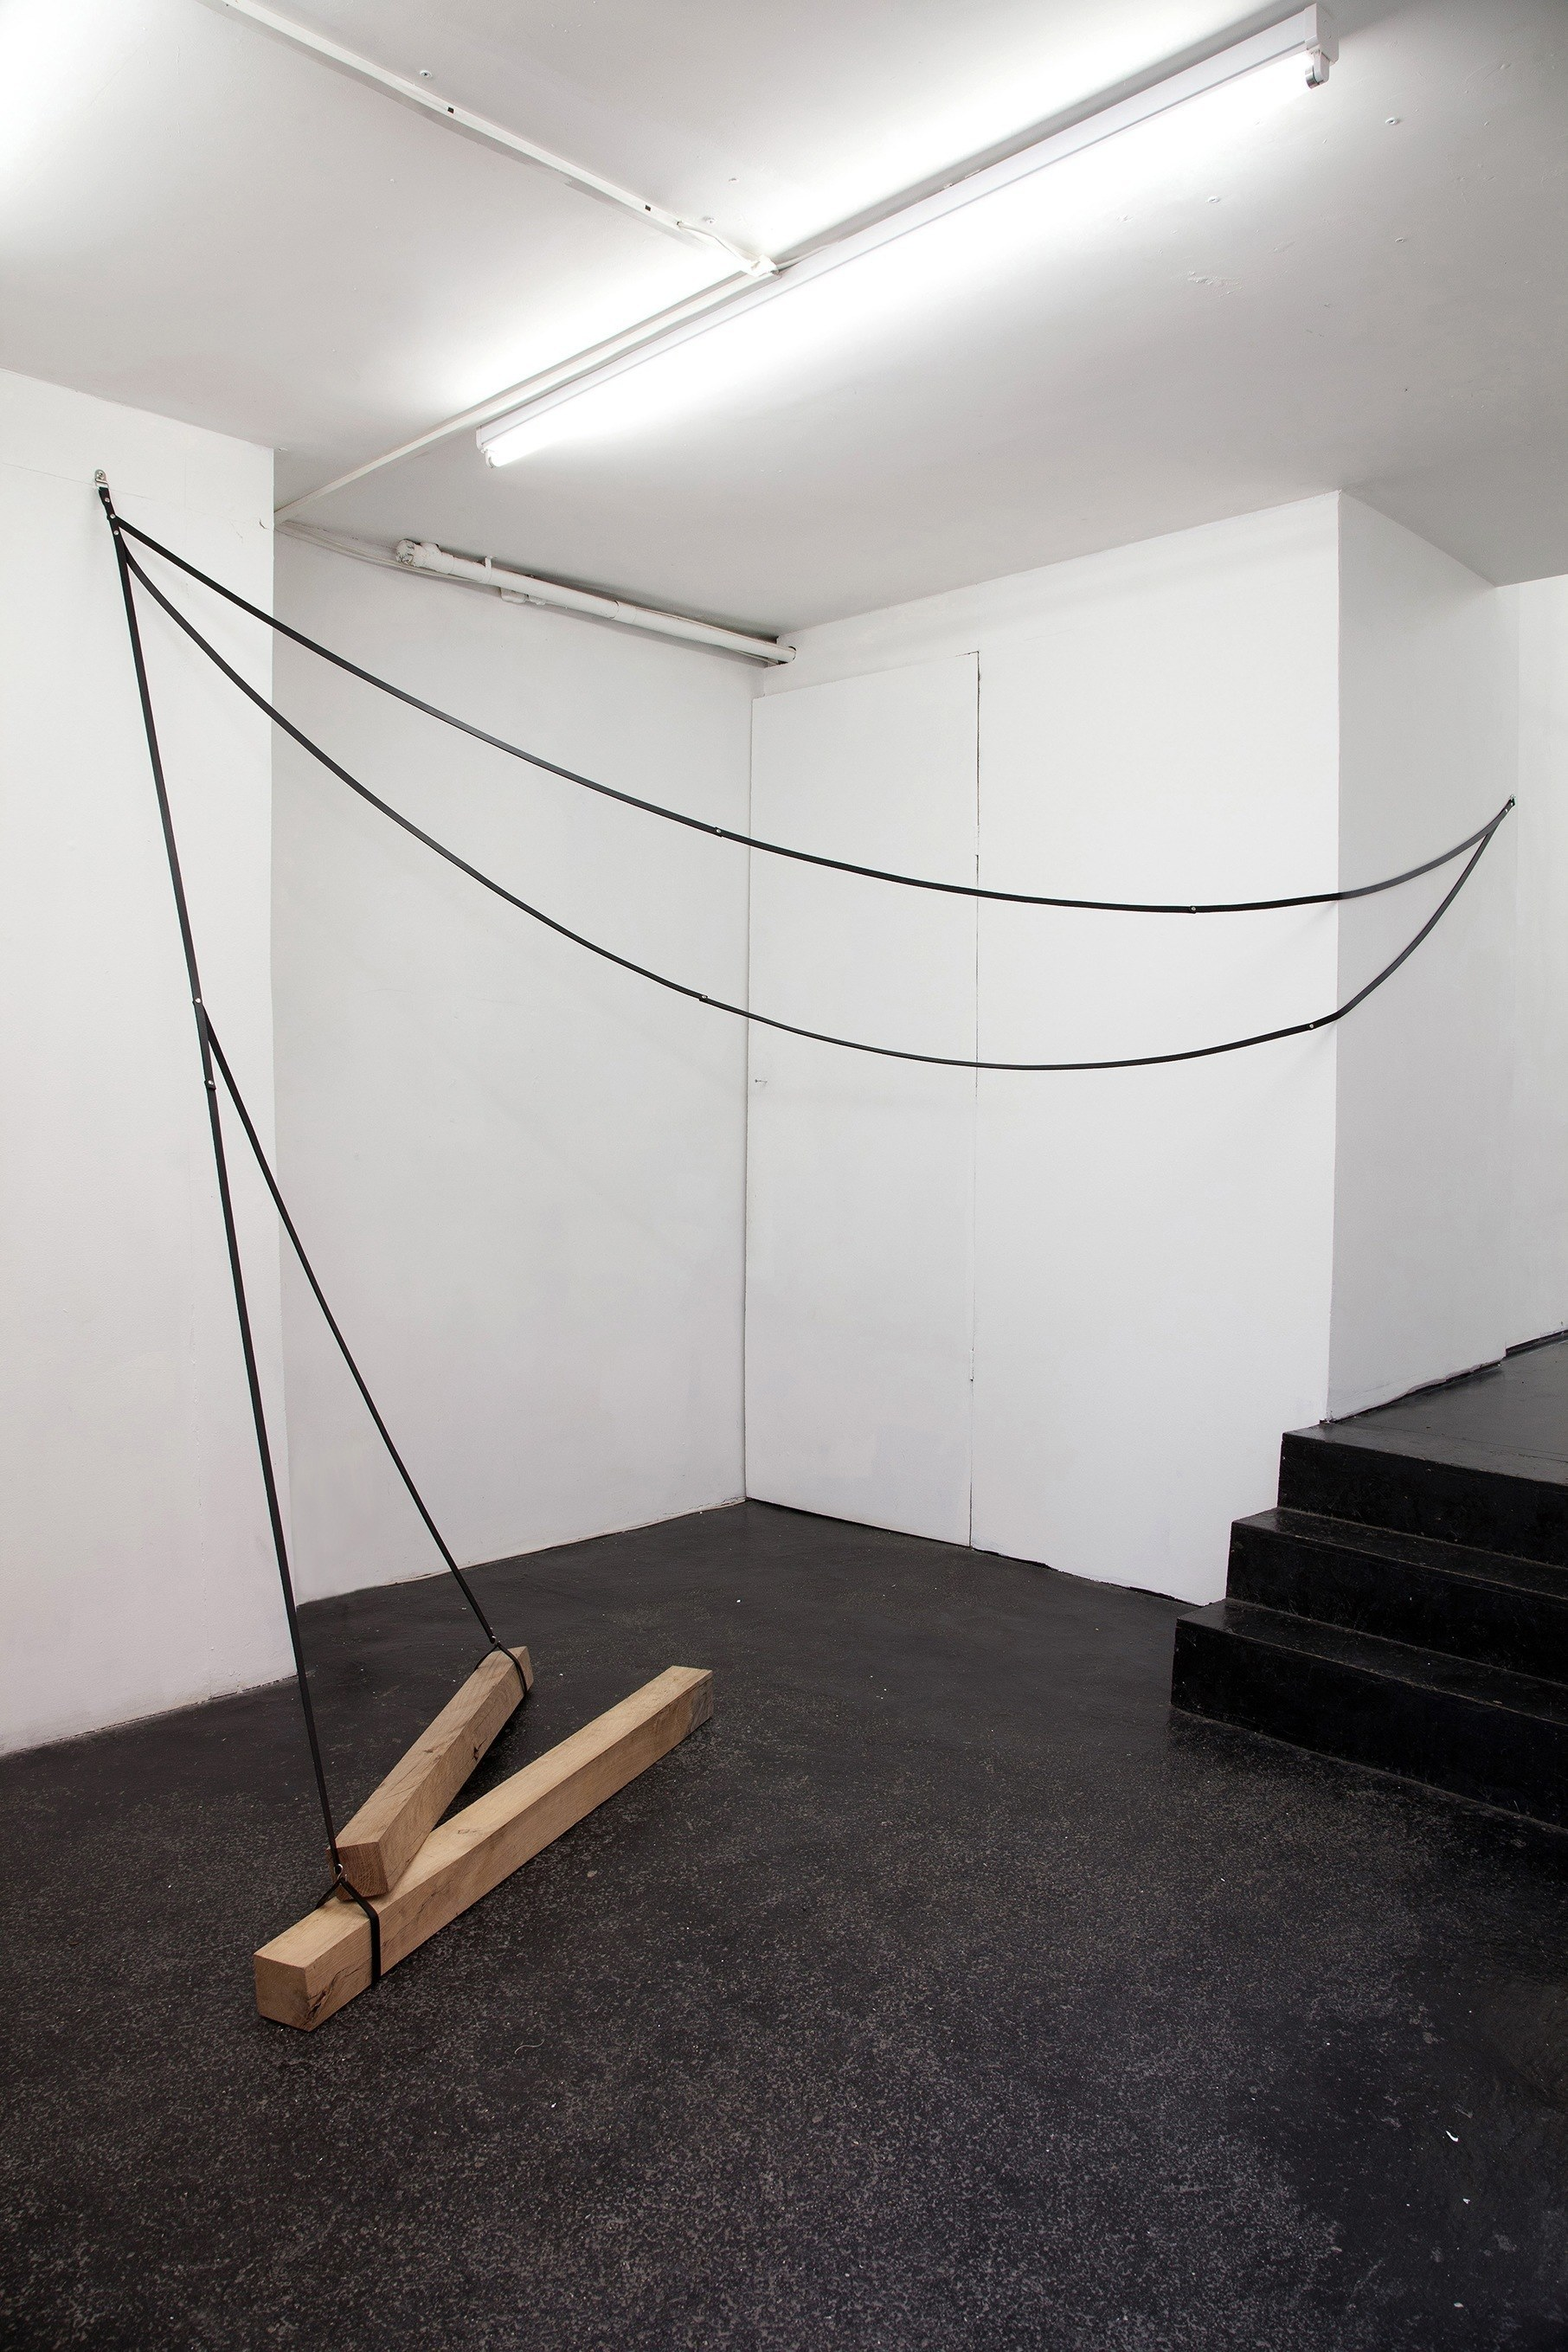 Simona Brinkmann. Underling (2014). Leather, oak, metal fittings.